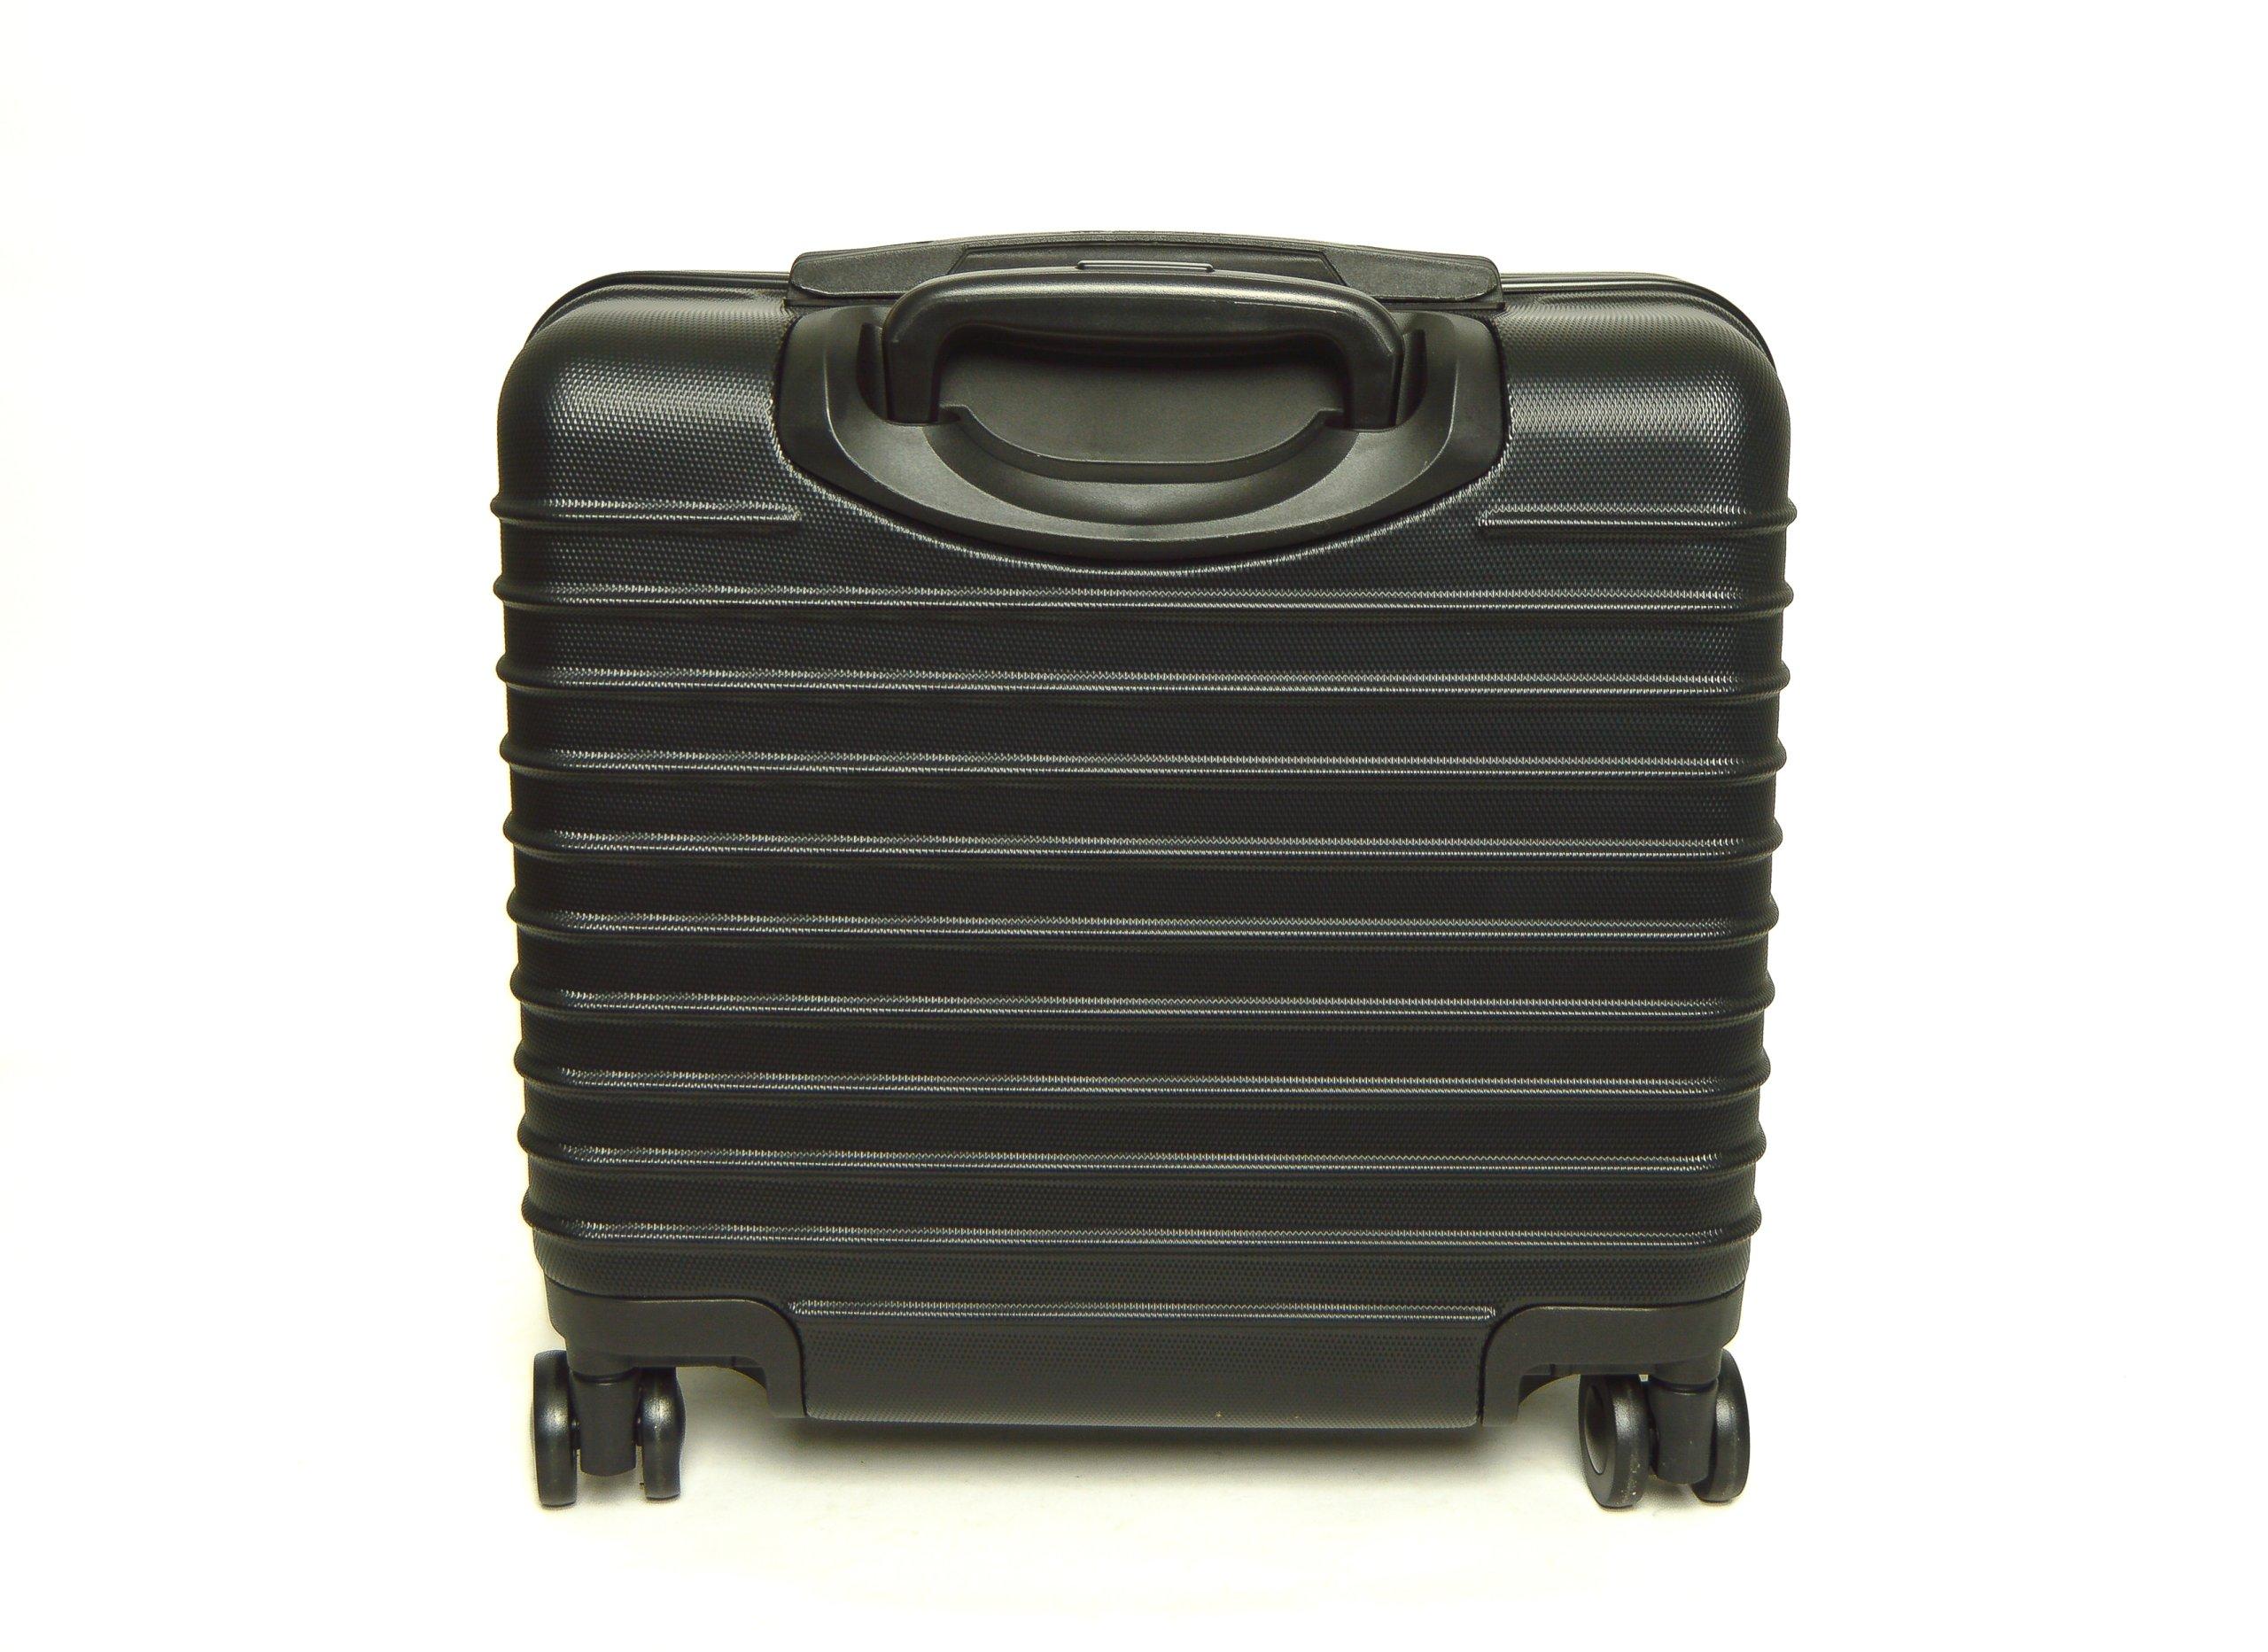 a77b0b4d4027a Extra walizka twarda 4 kółka pilotka SWISS CONCEPT - 7262242828 ...